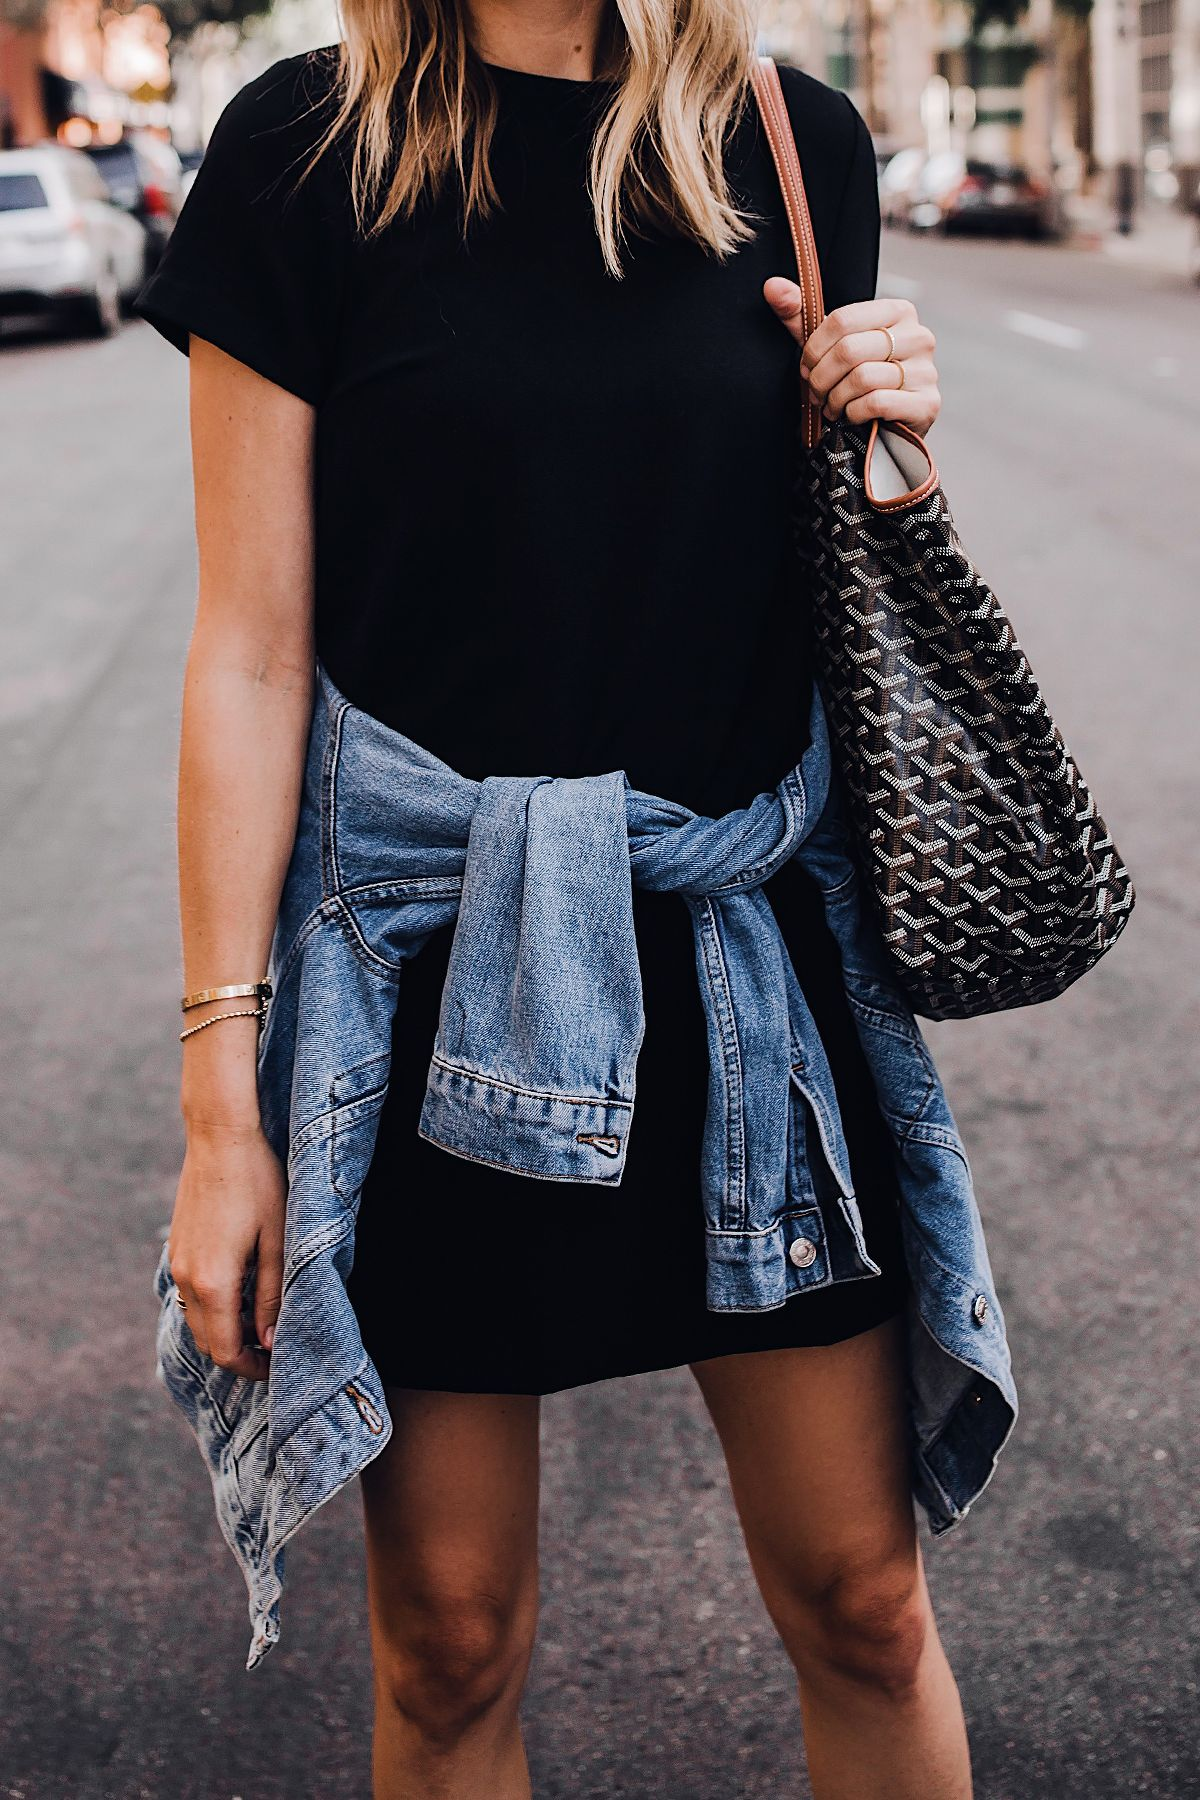 Blonde Woman Wearing Fashion Jackson Short Sleeve Black Dress Denim Jacket Goyard Tote Fashion Jackson S Black Dress Outfit Casual Casual Style Outfits Fashion [ 1800 x 1200 Pixel ]